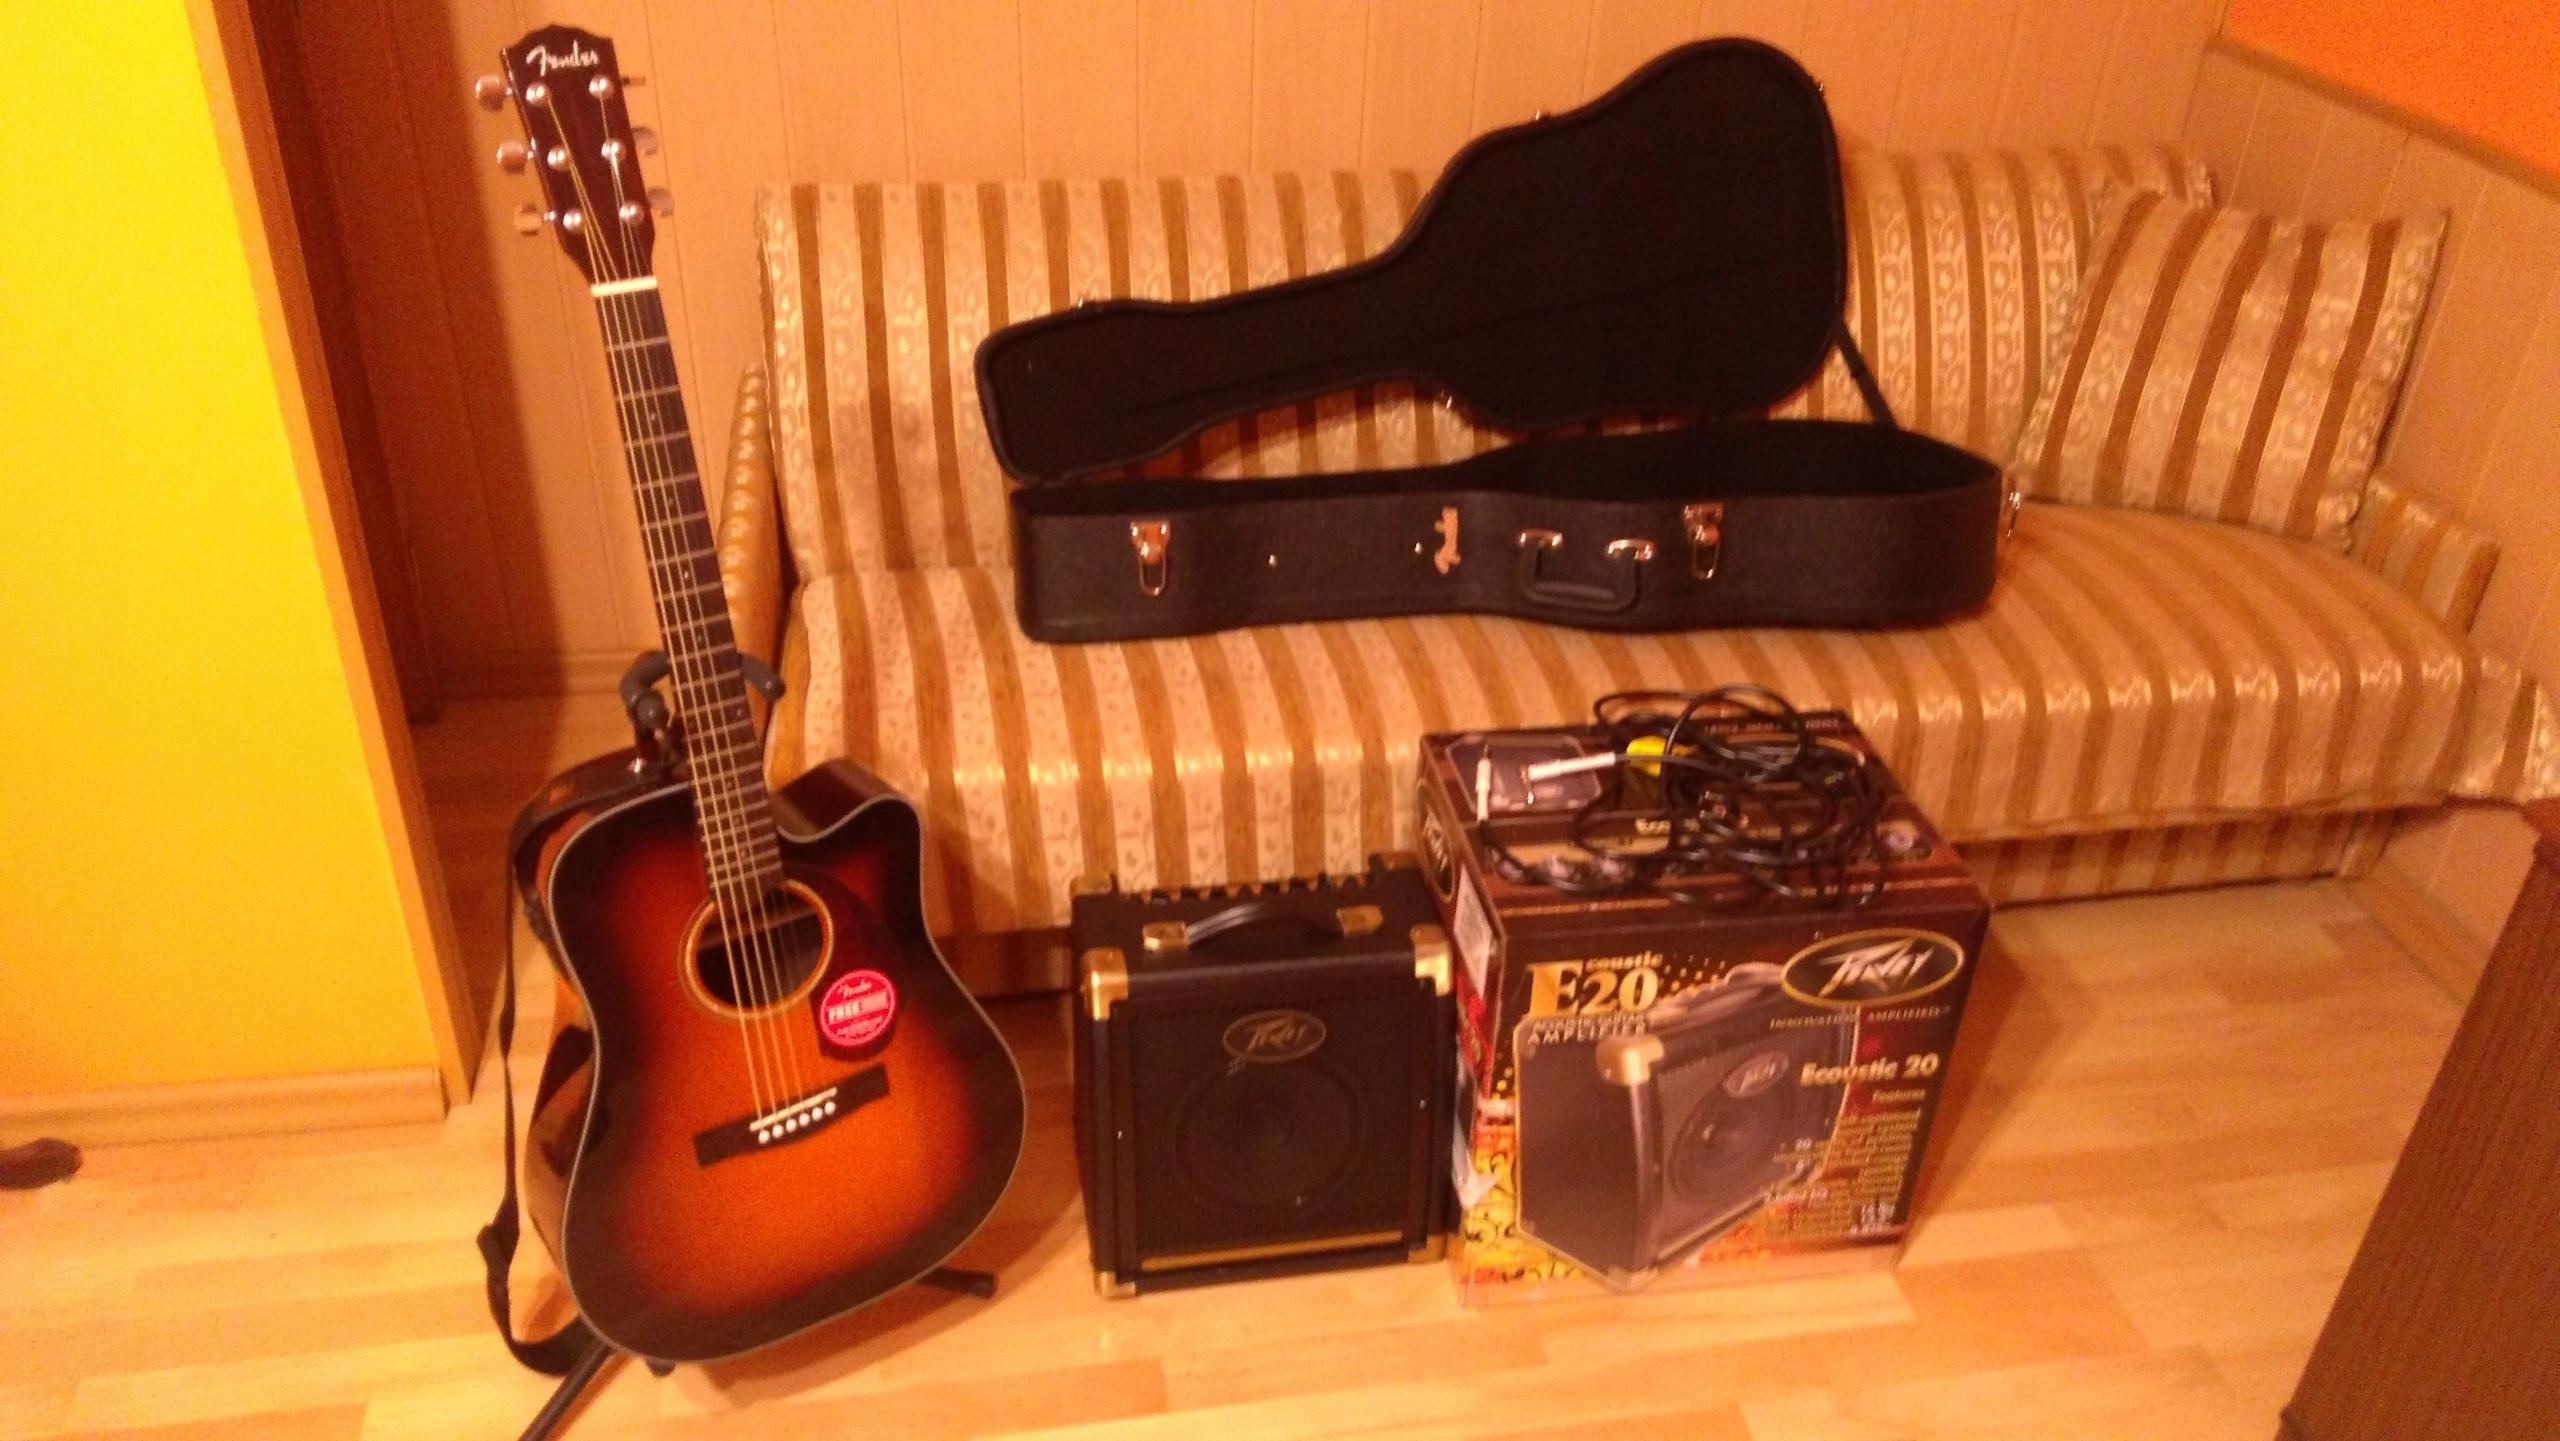 Zestaw Fender CD-140SCE Peavey E20 Hamilton Guitar